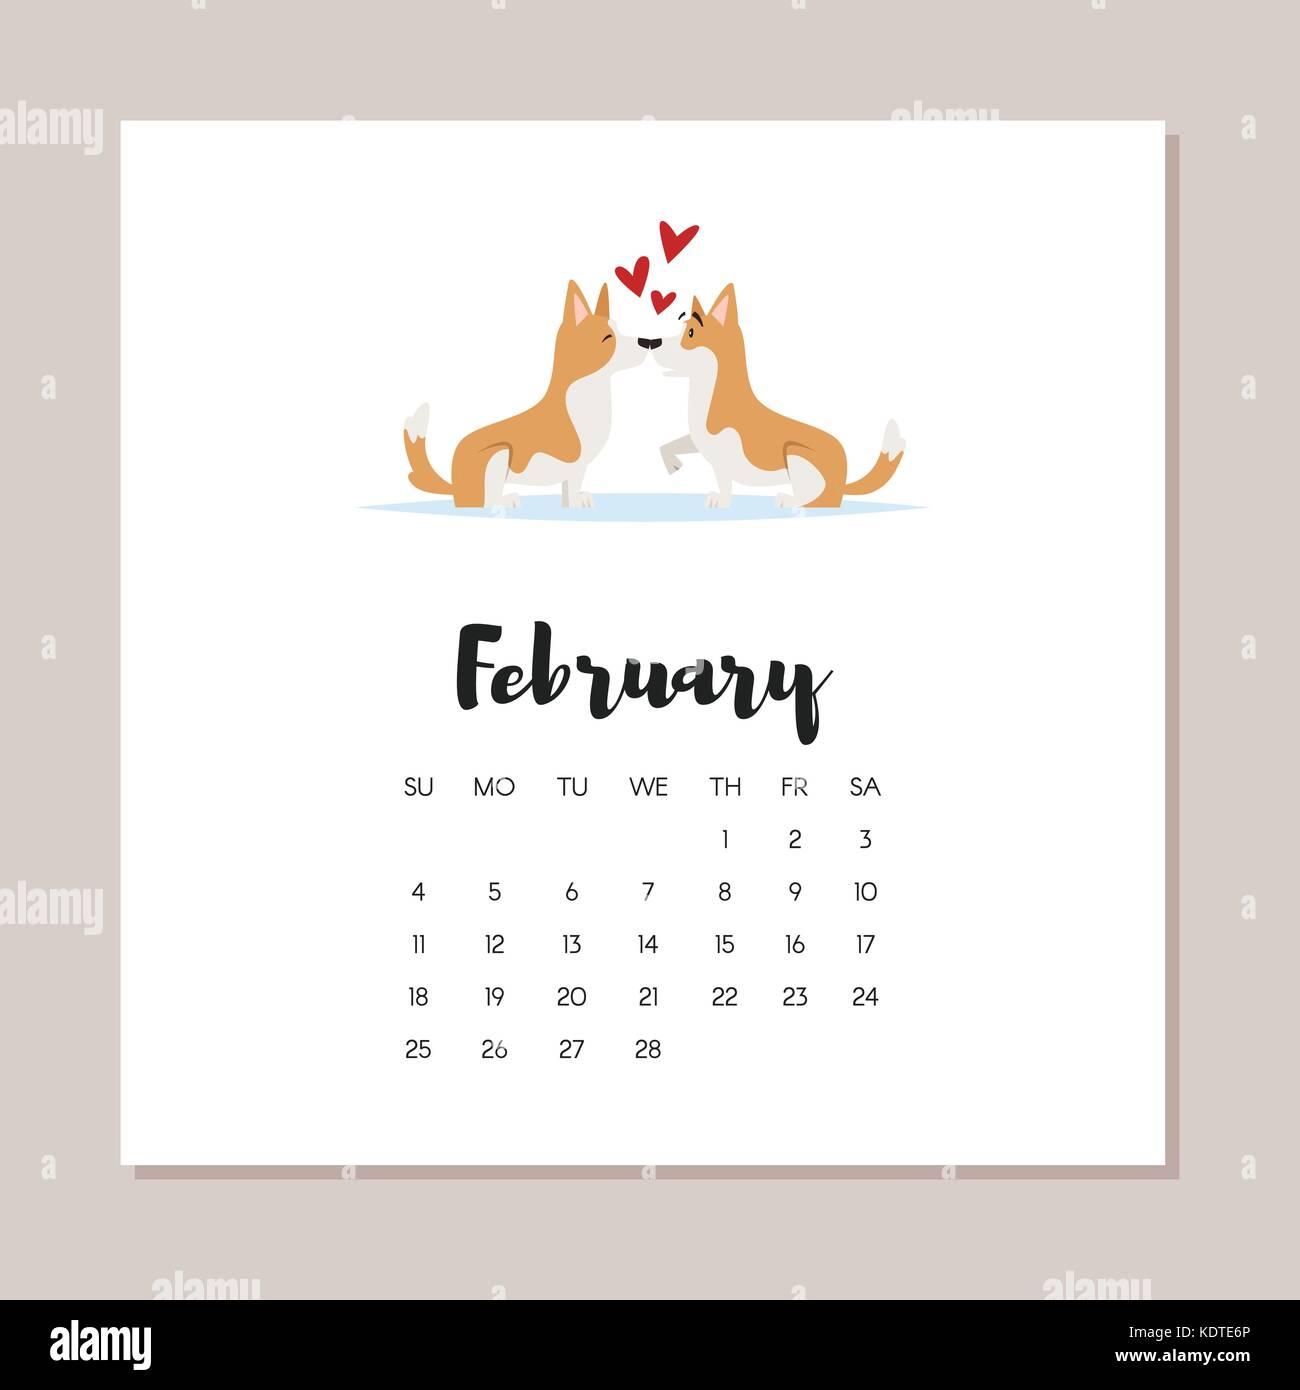 February Calendar Illustration : Vector cartoon style illustration of february dog